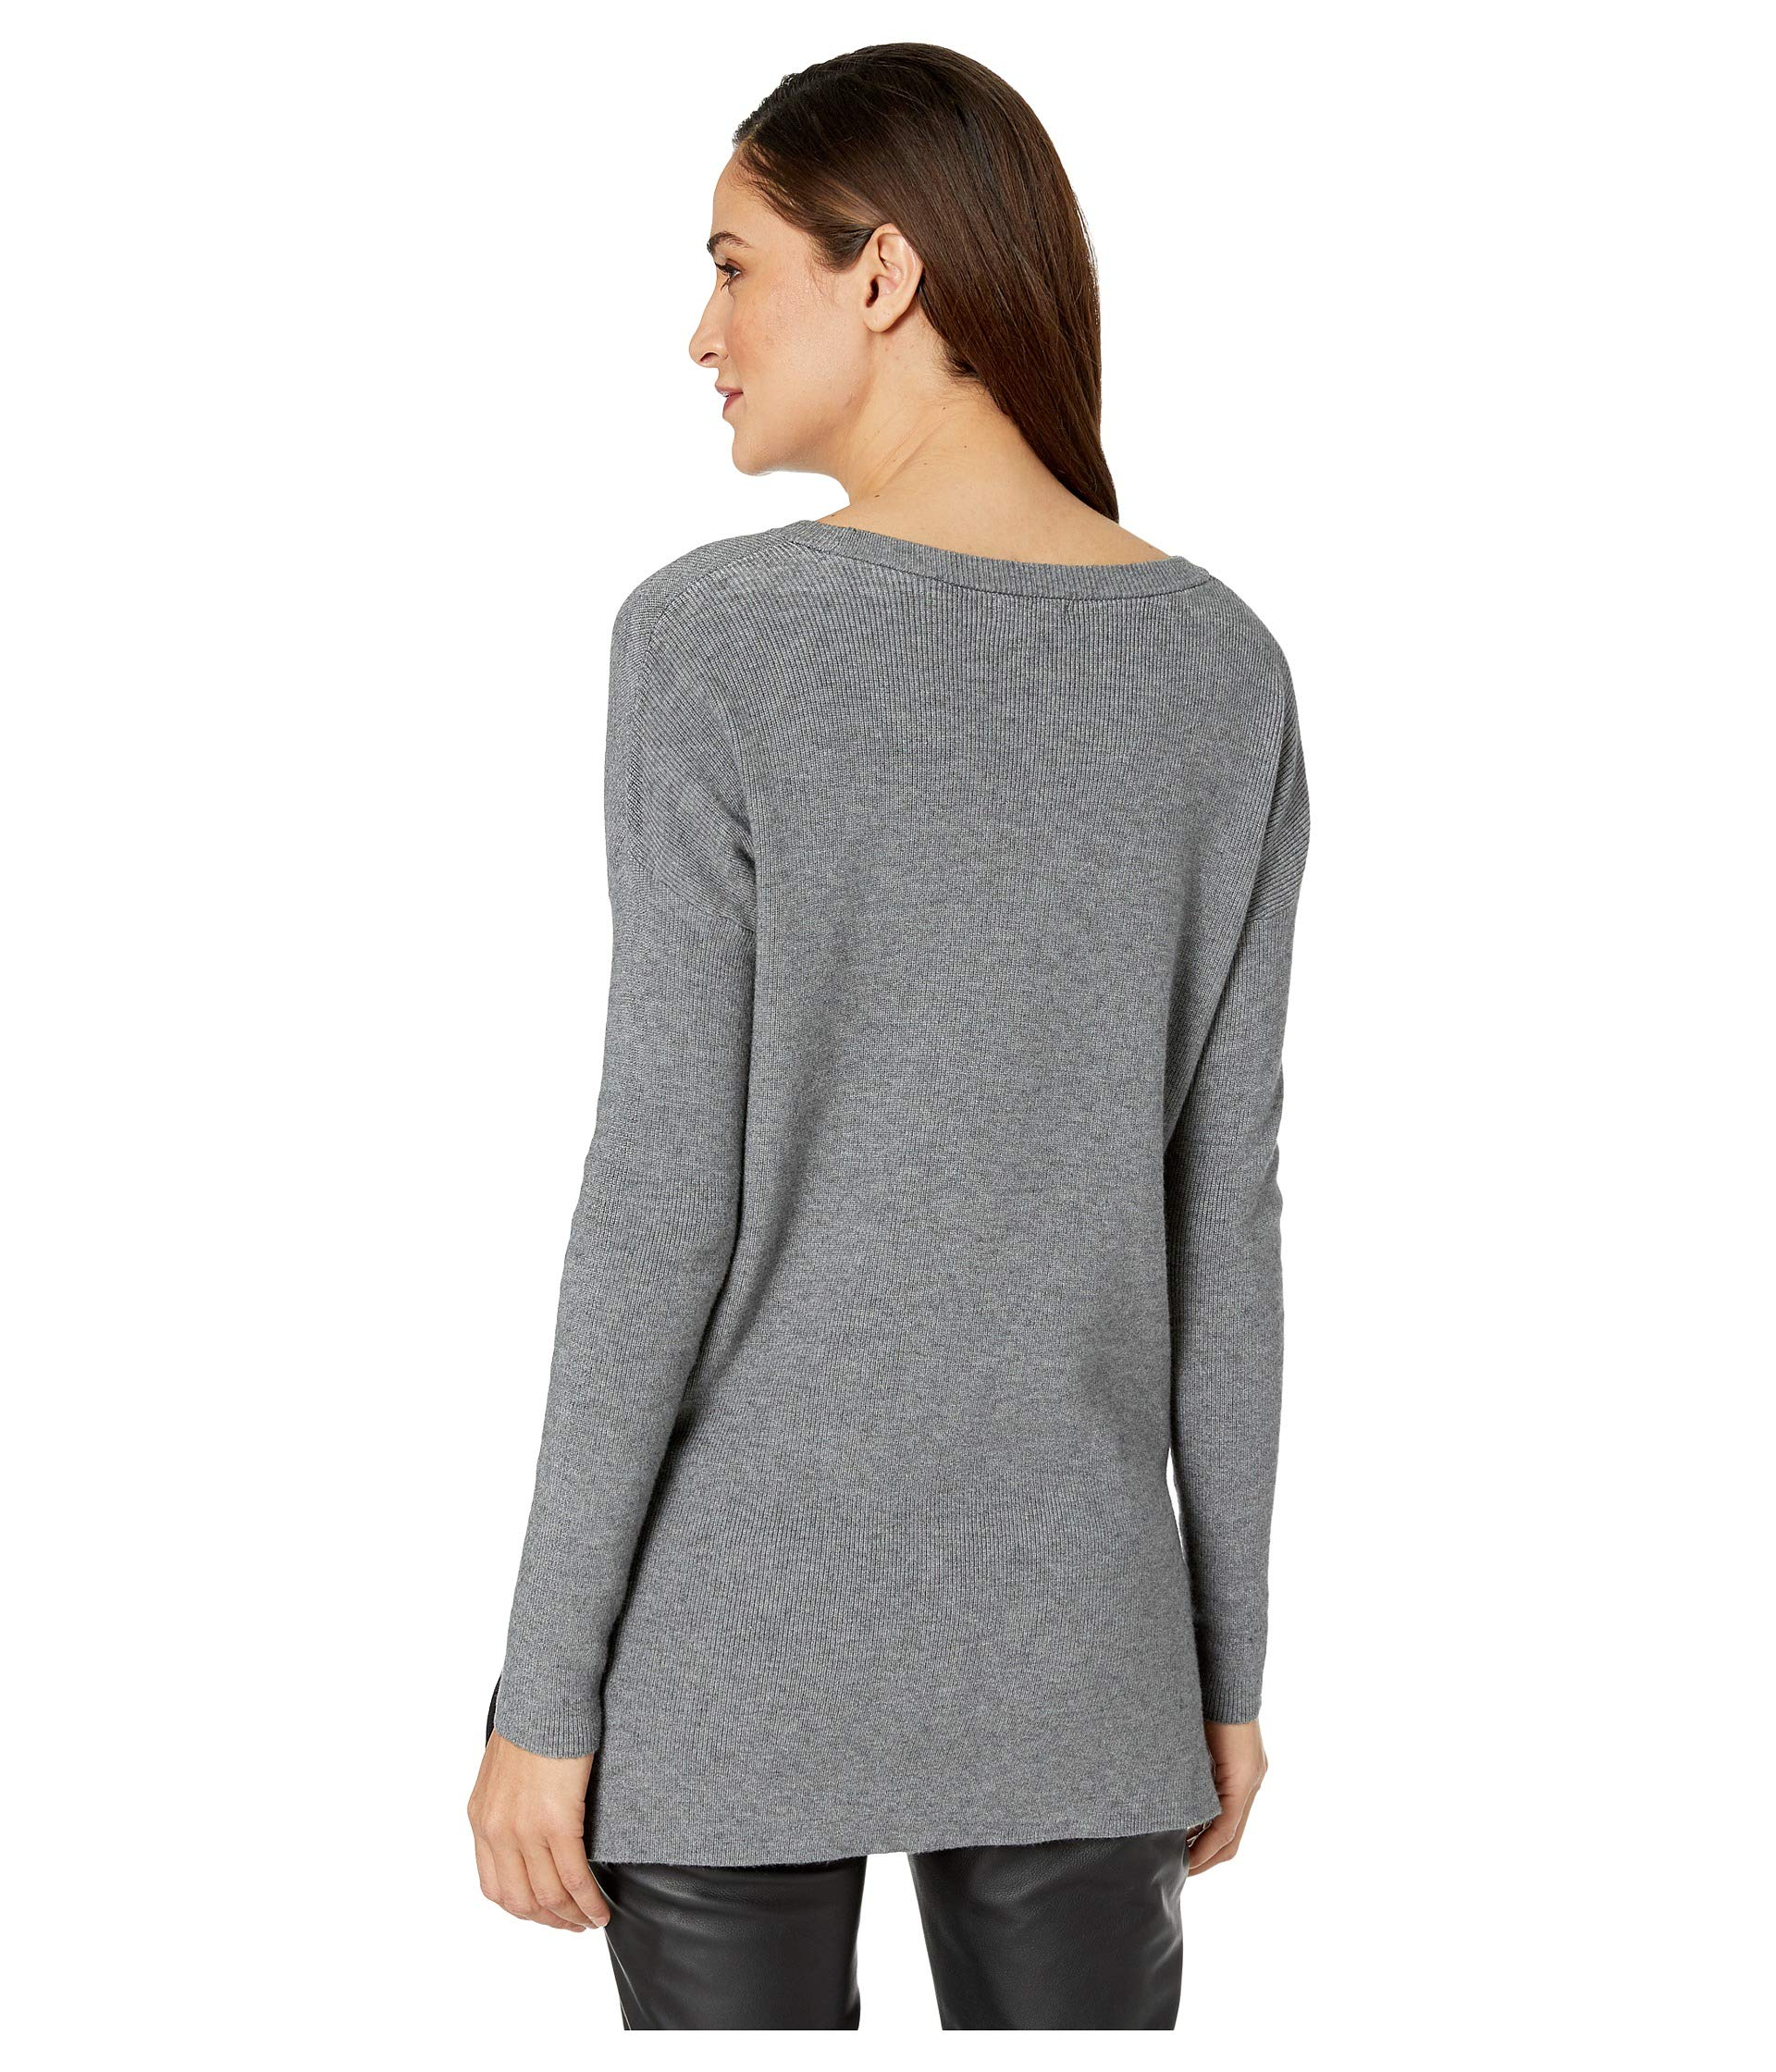 Fuzzy Blend Ks1k5930 Kensie Steel Viscose Sweatshirt Heather 08wEAdx